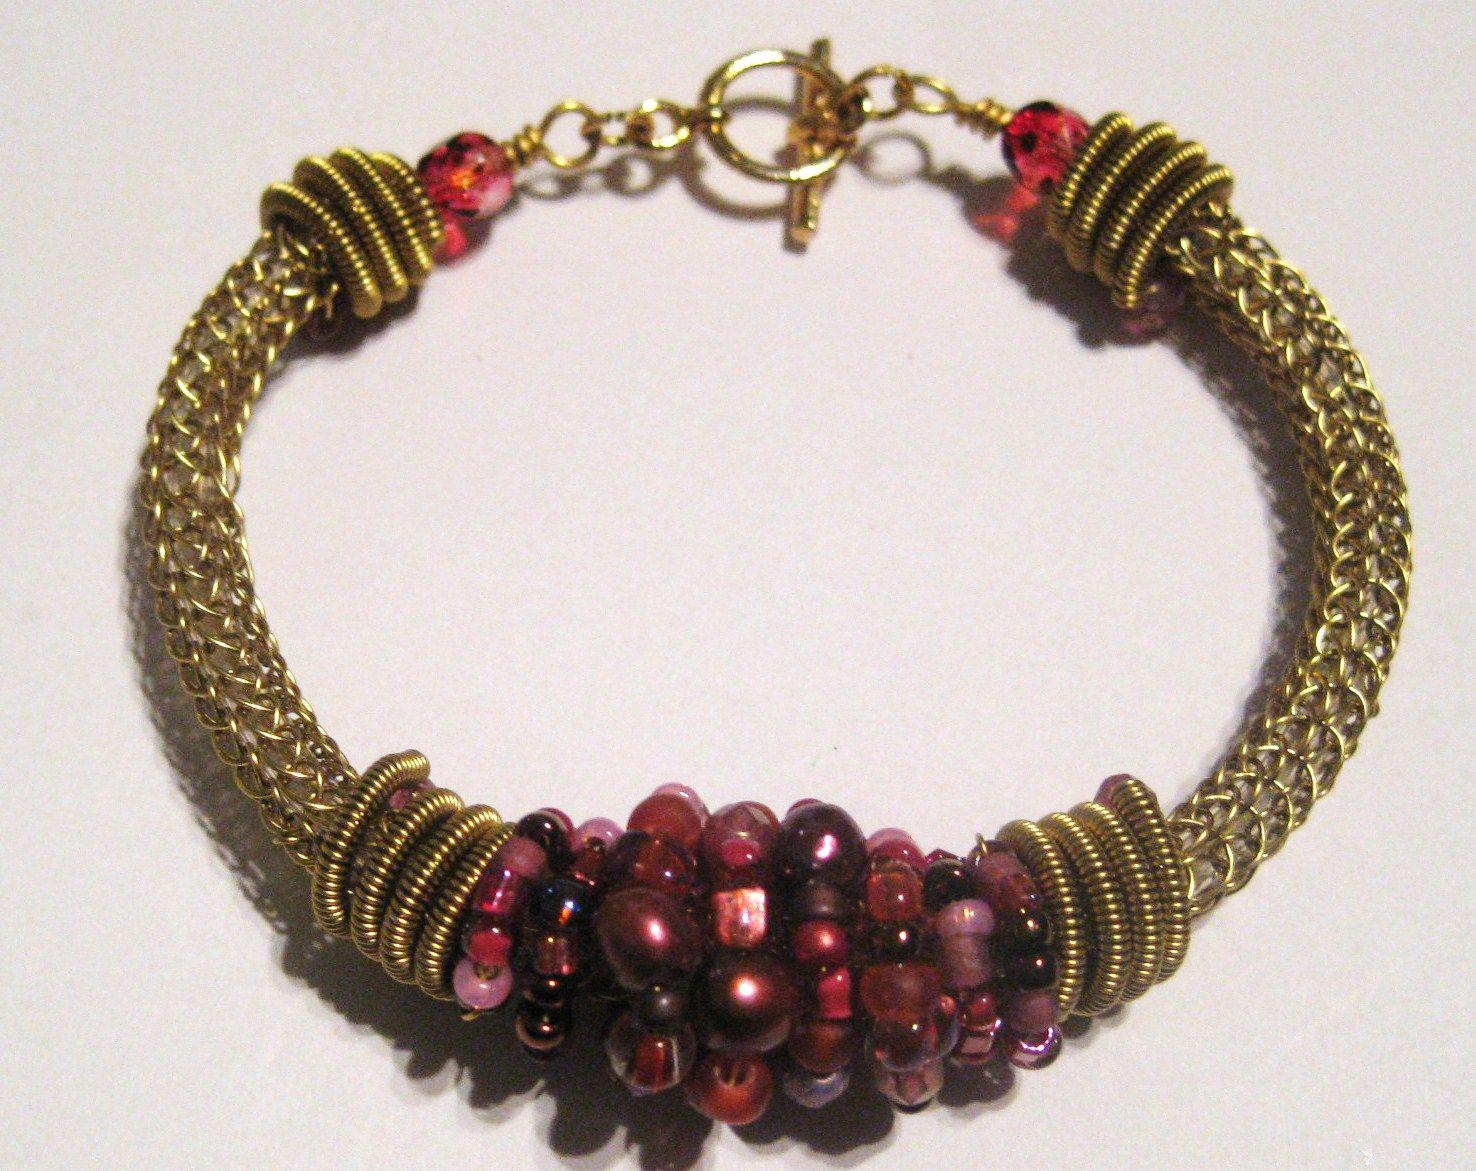 viking knit | Viking Knit Neck or Brac Project Kit I | Jewelry ...